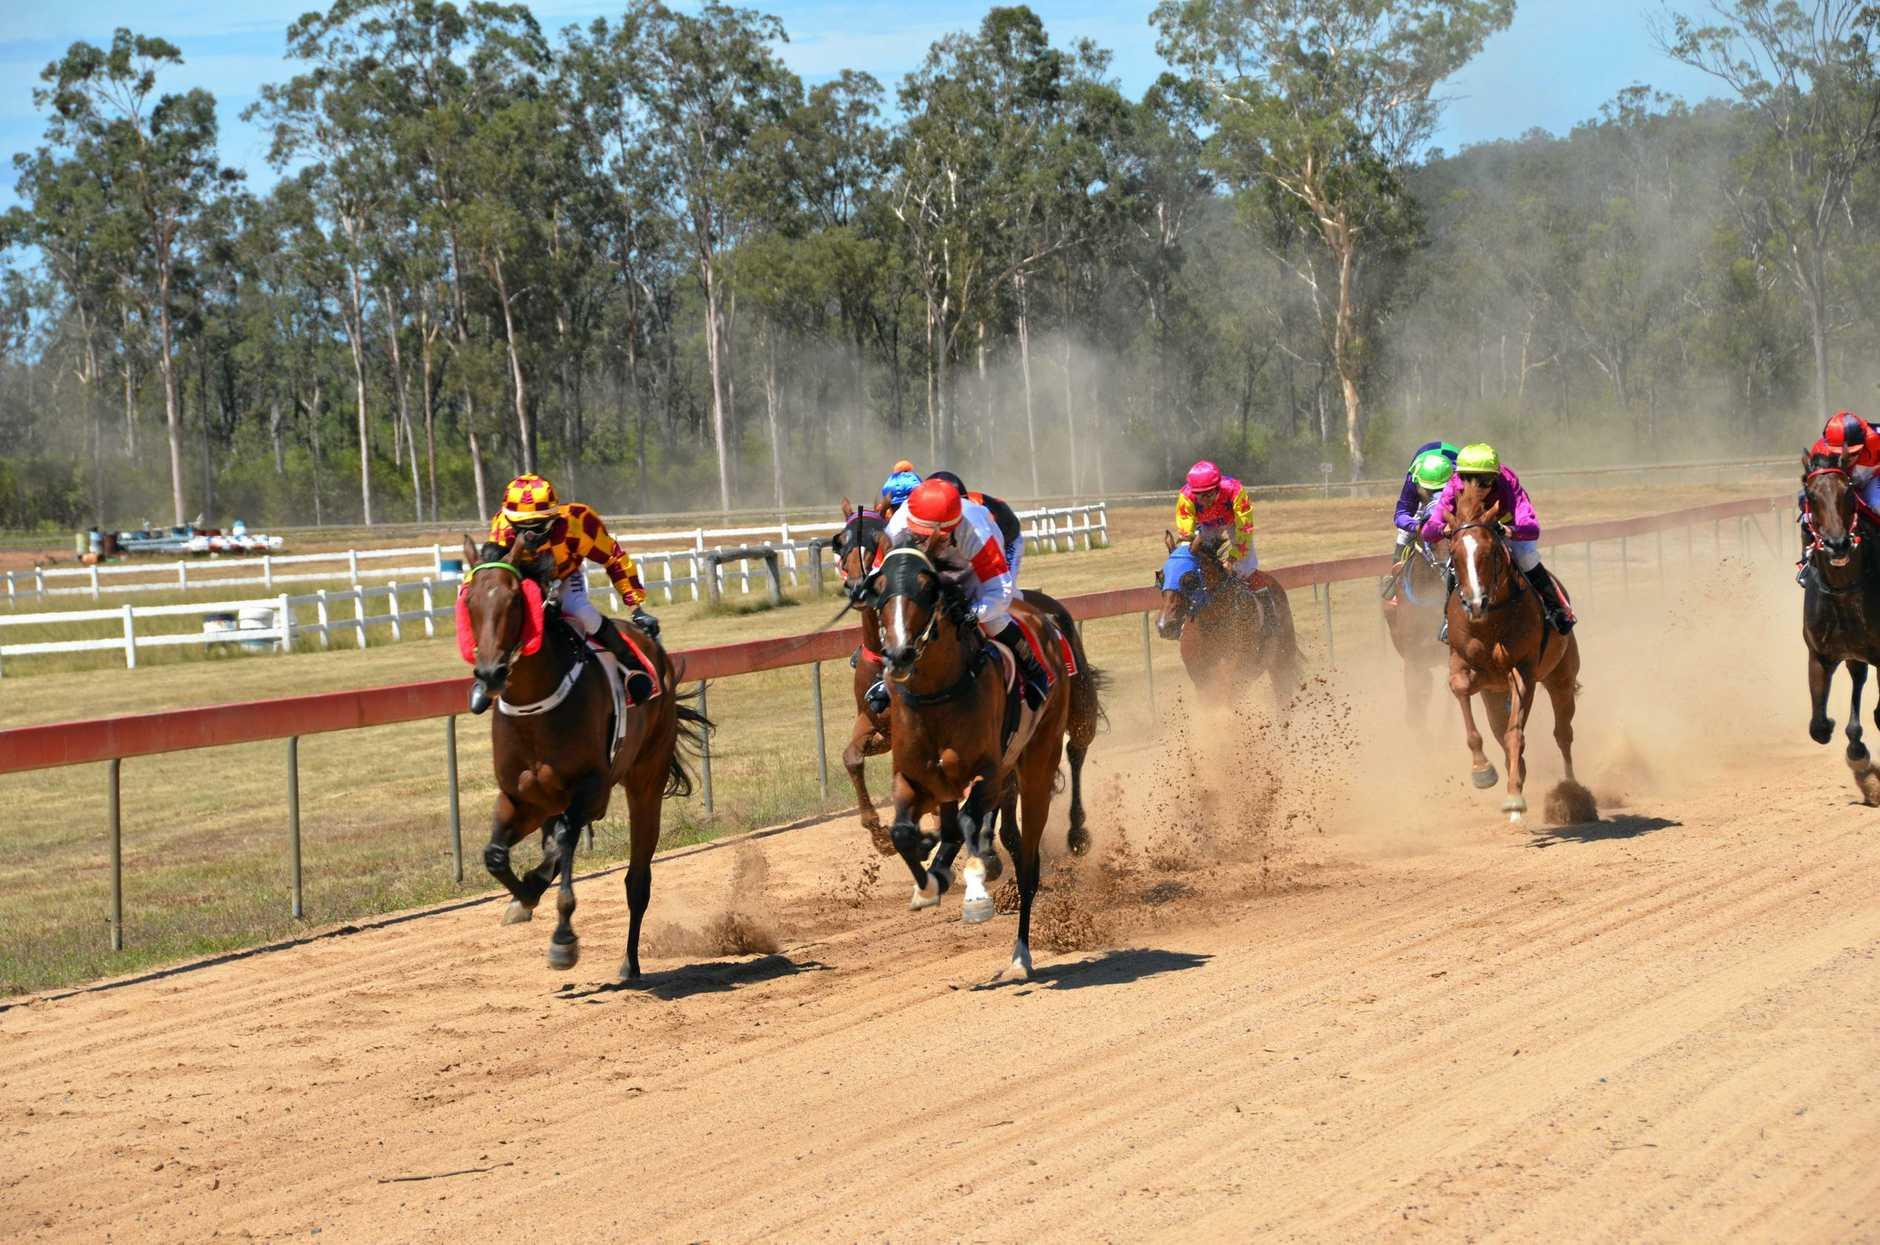 The Gayndah to Wondai Open Handicap at the Wondai Races